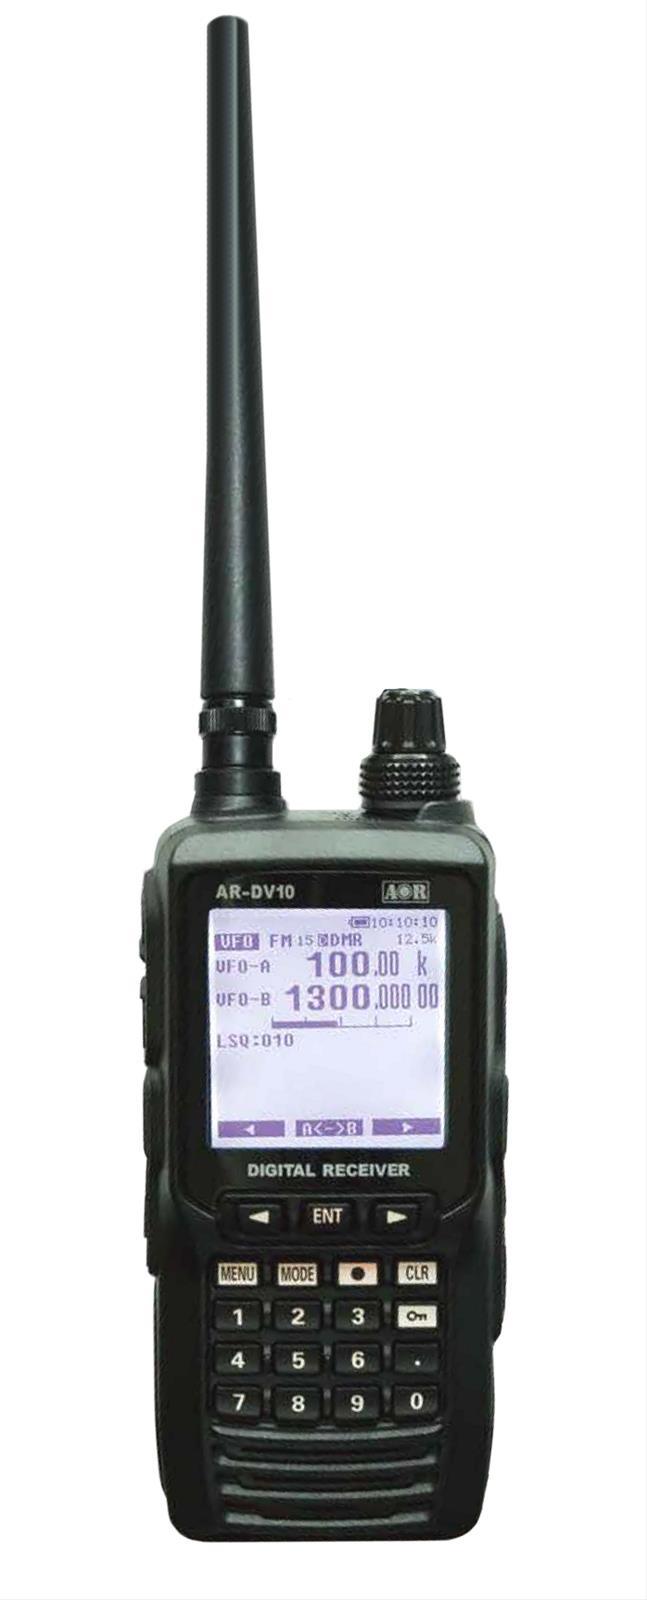 Yaesu AR-DV10 SDR Handheld Receiver AR-DV10 - Free Shipping